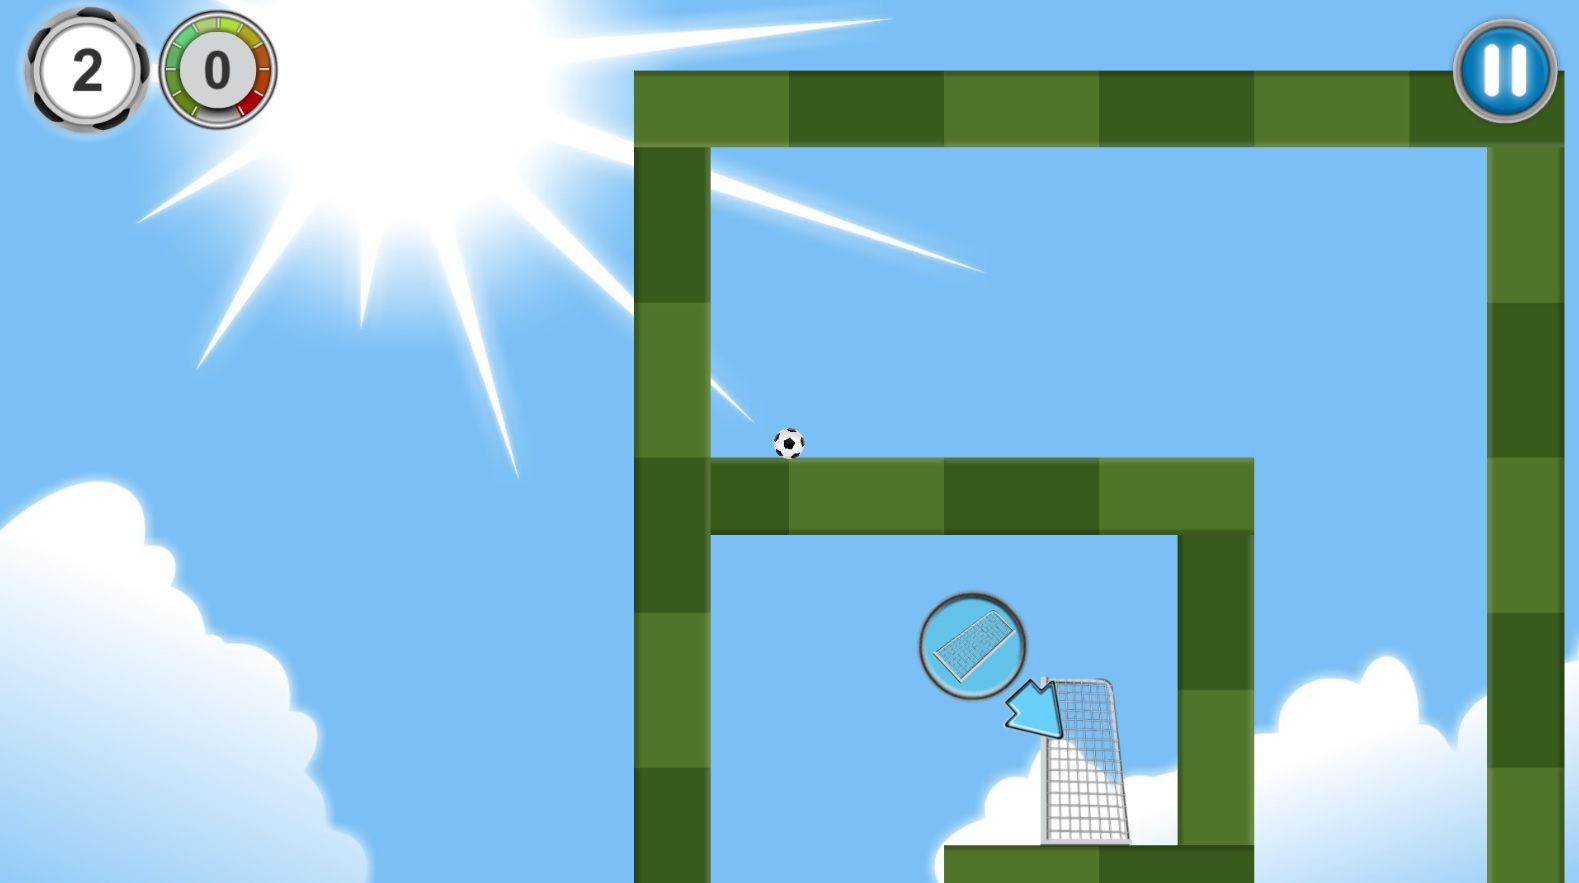 ic2 | Maze football